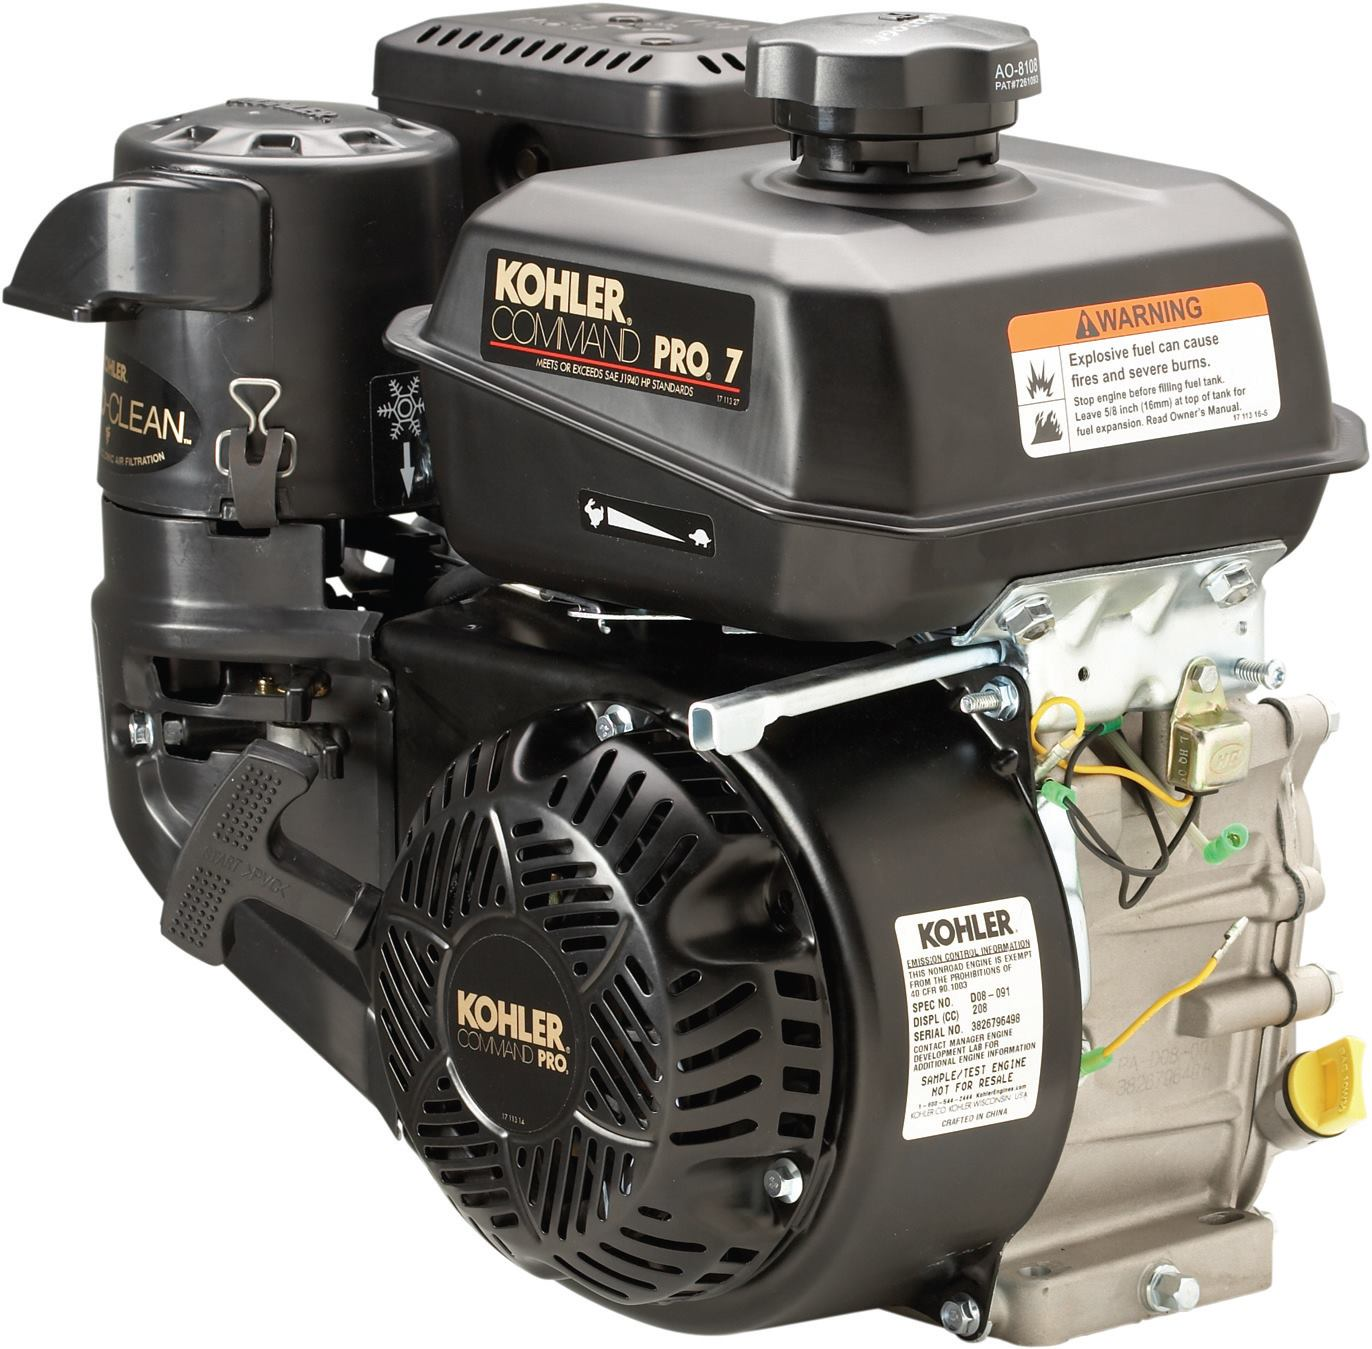 Kohler Engines Command Pro With Quad Clean Concrete Construction 2 7 Engine Schematics Magazine Indoor Air Quality Jobsite Equipment